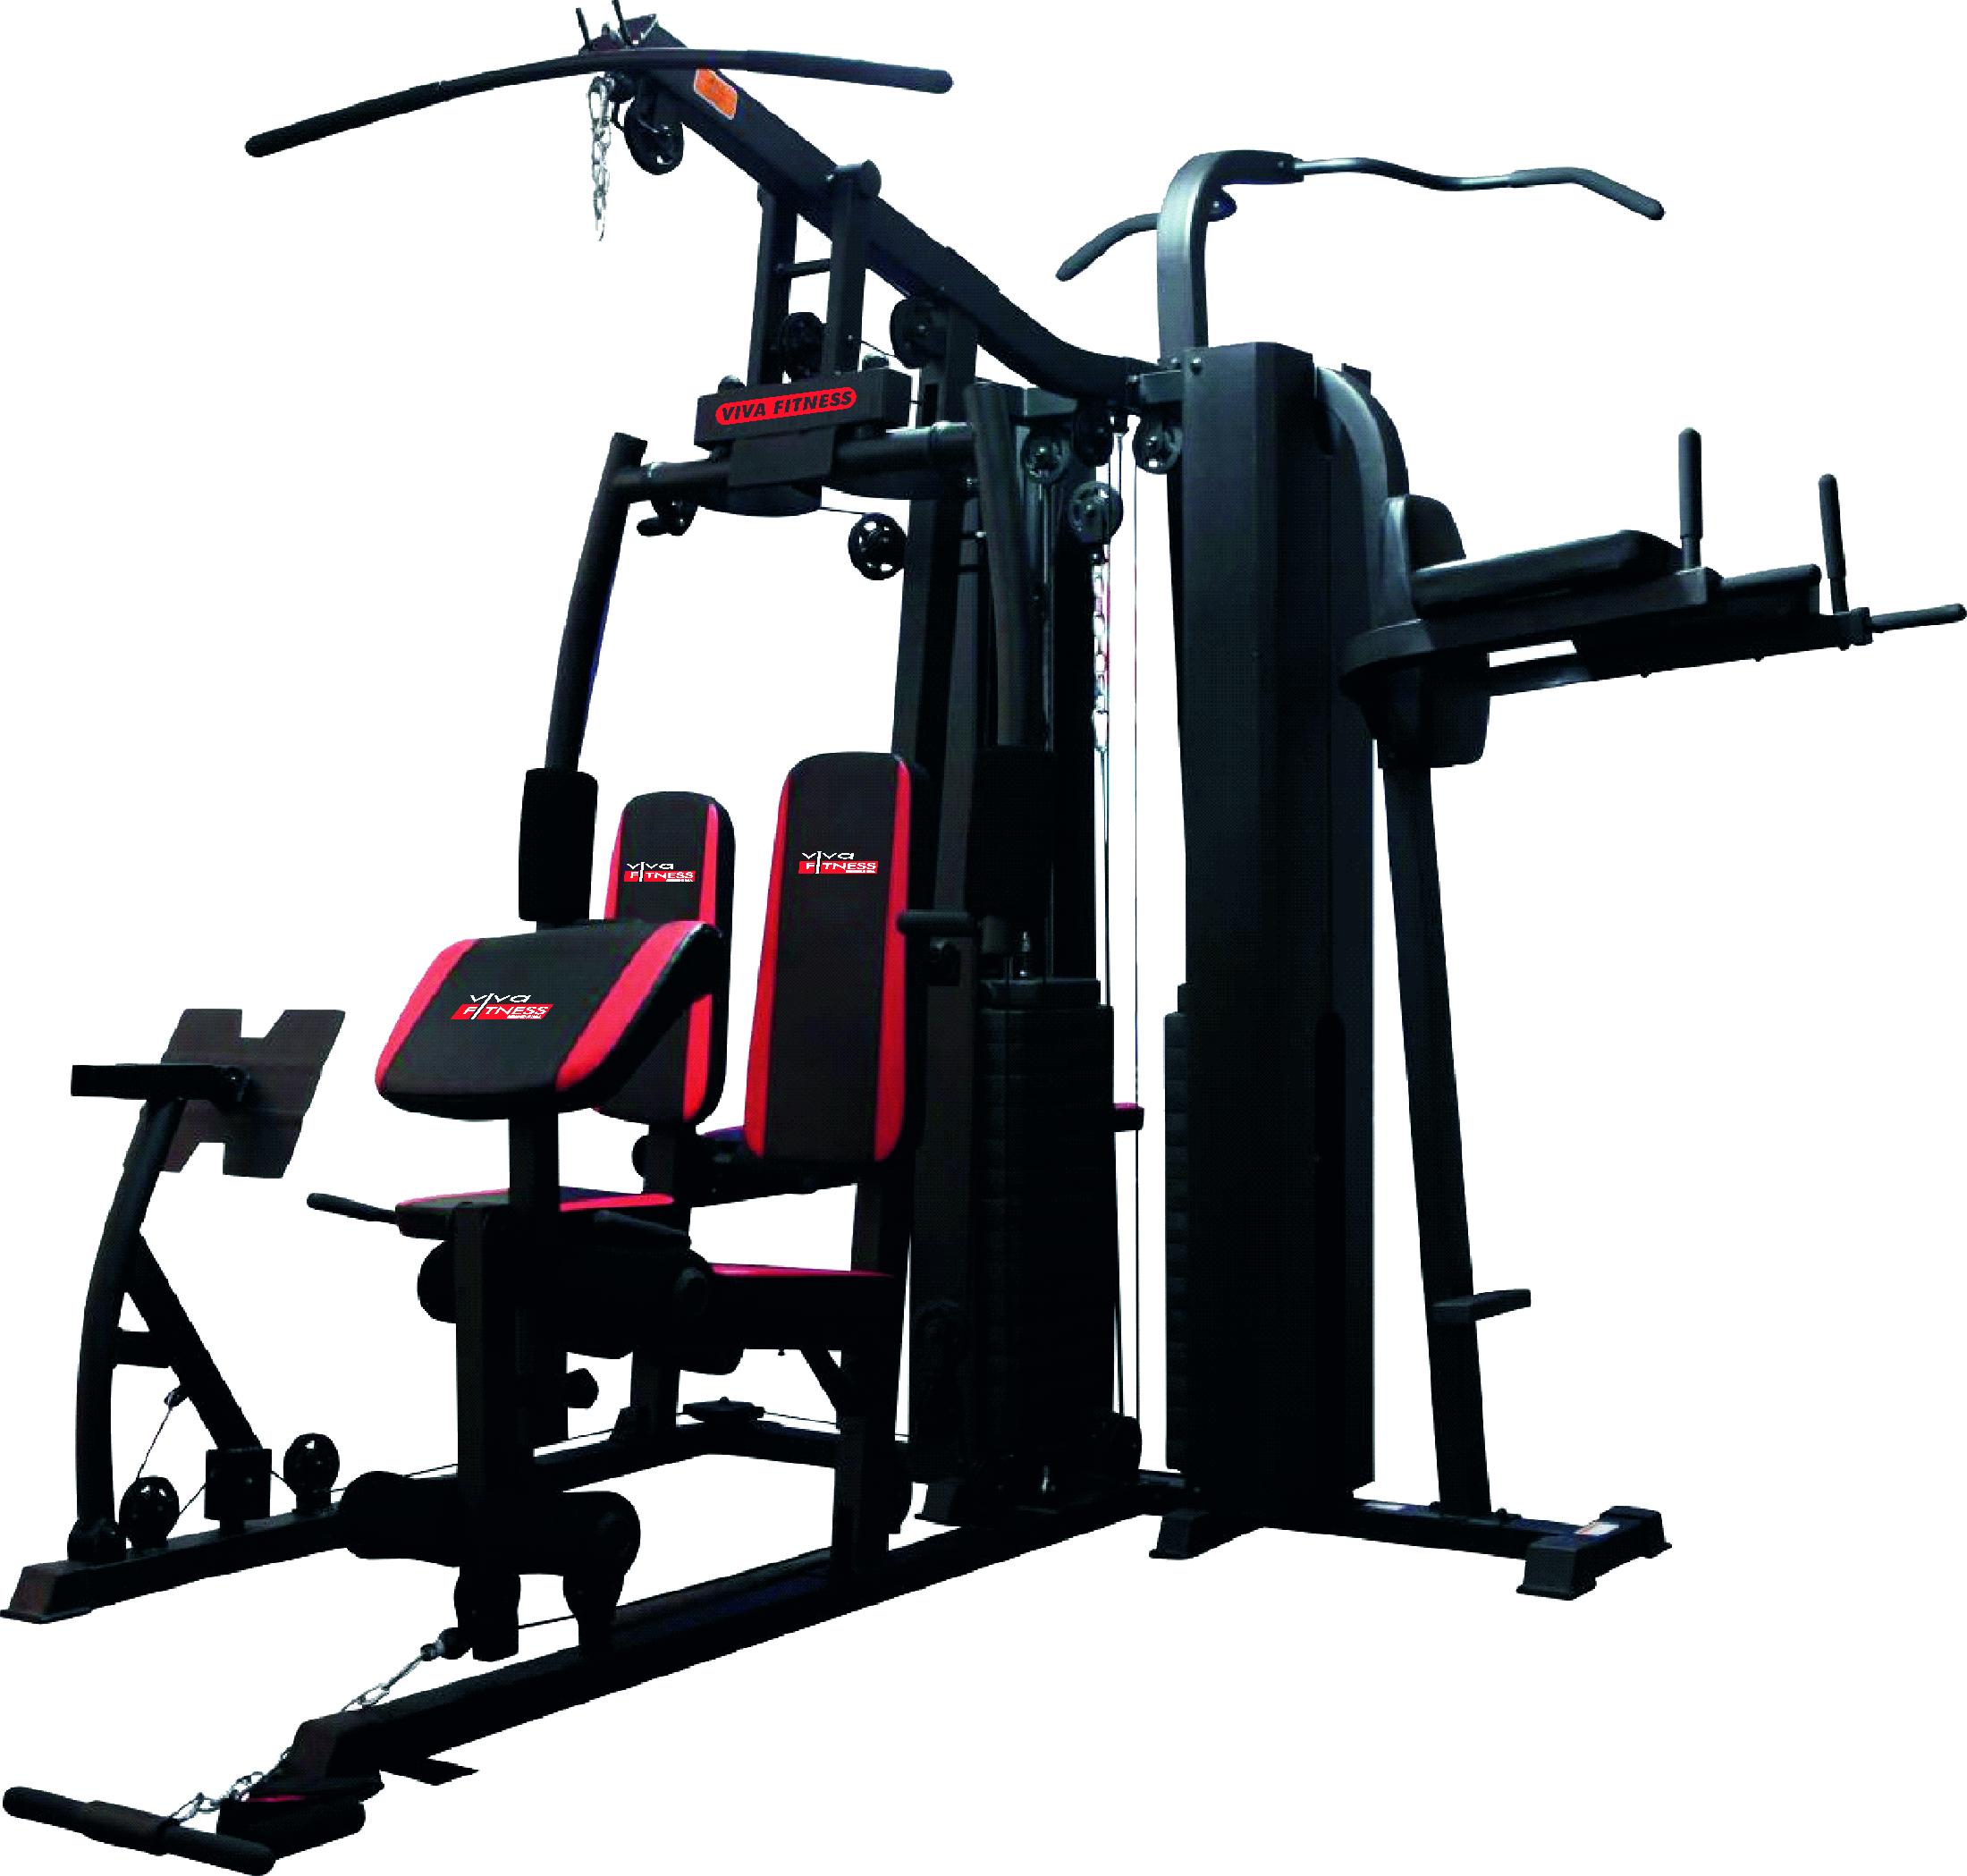 418BA STELLA Light Commercial Multi Gym